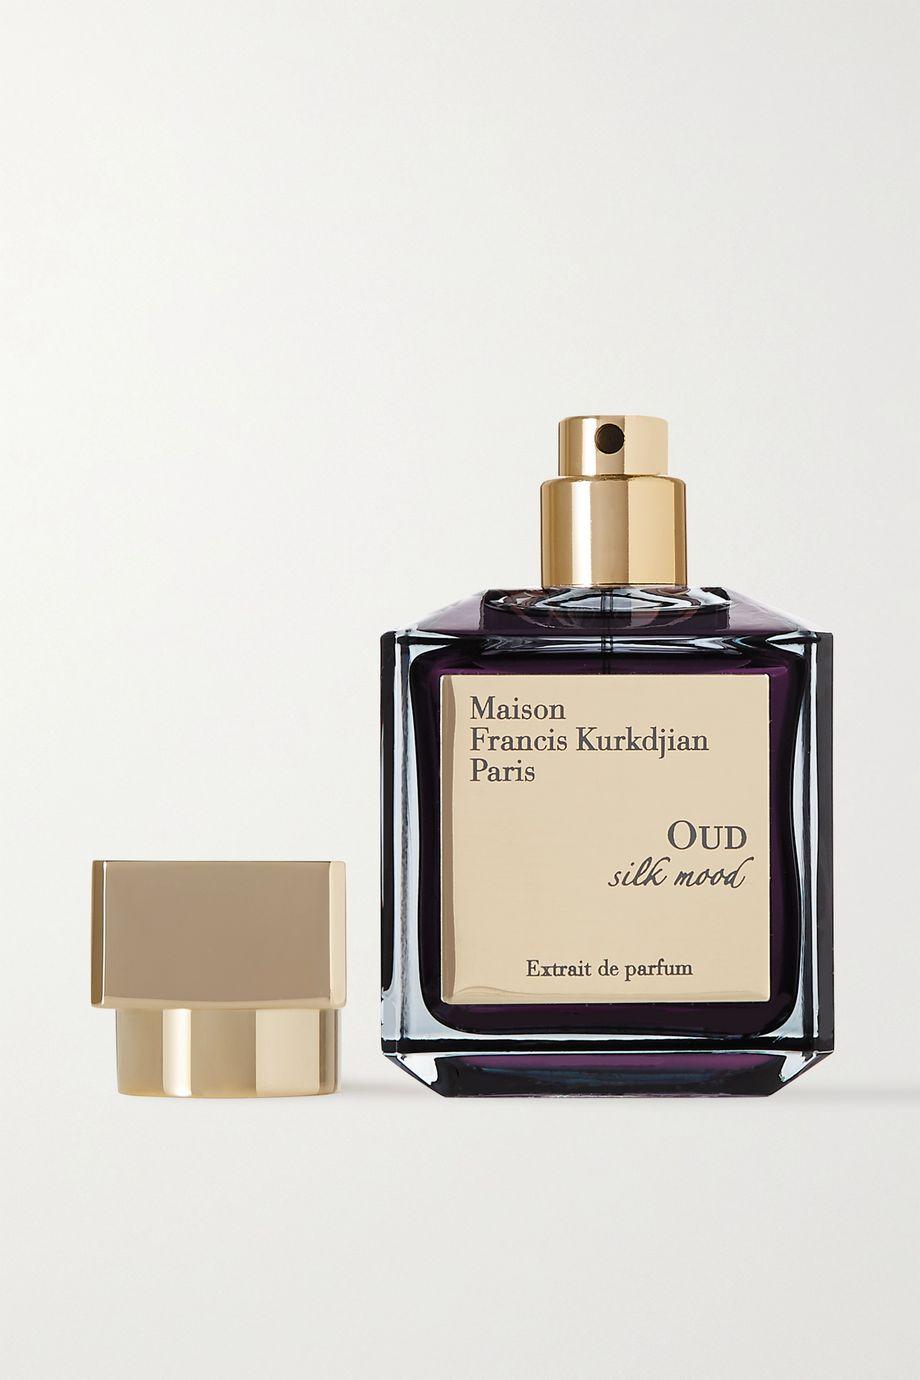 Maison Francis Kurkdjian Oud Silk Mood Extrait de Parfum - Rose & Oud, 70ml